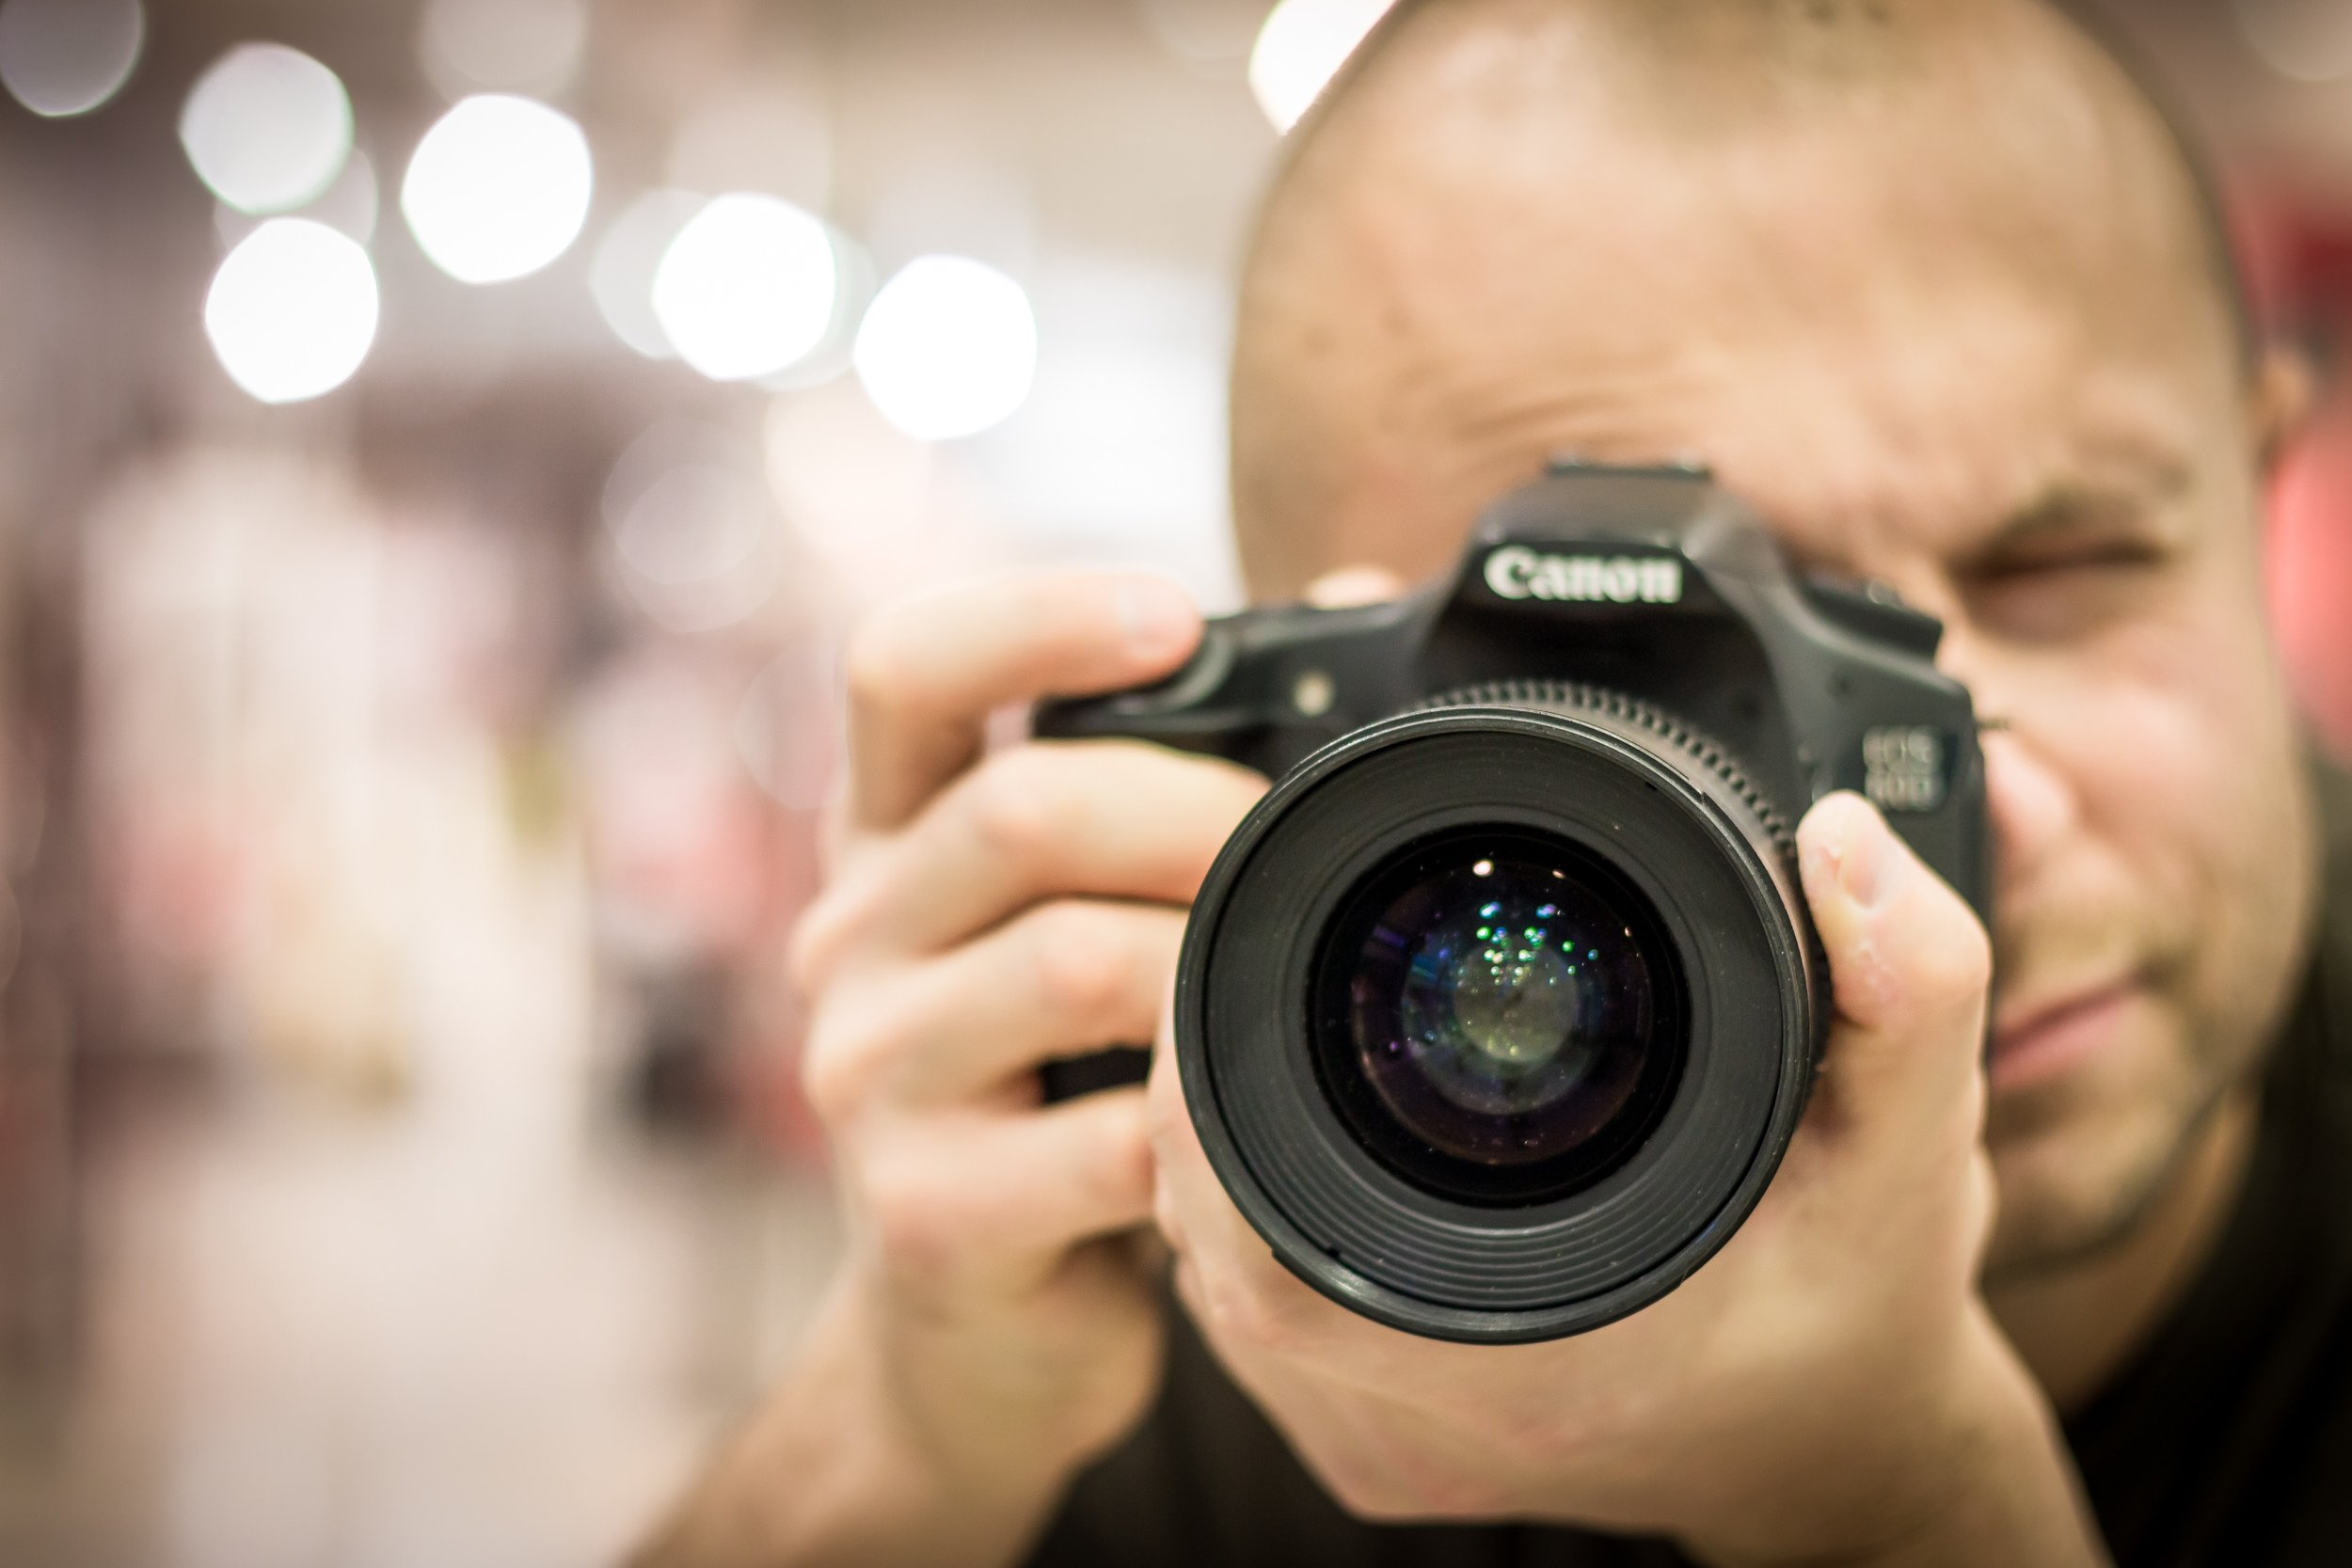 camera-canon-dslr-52985.jpg